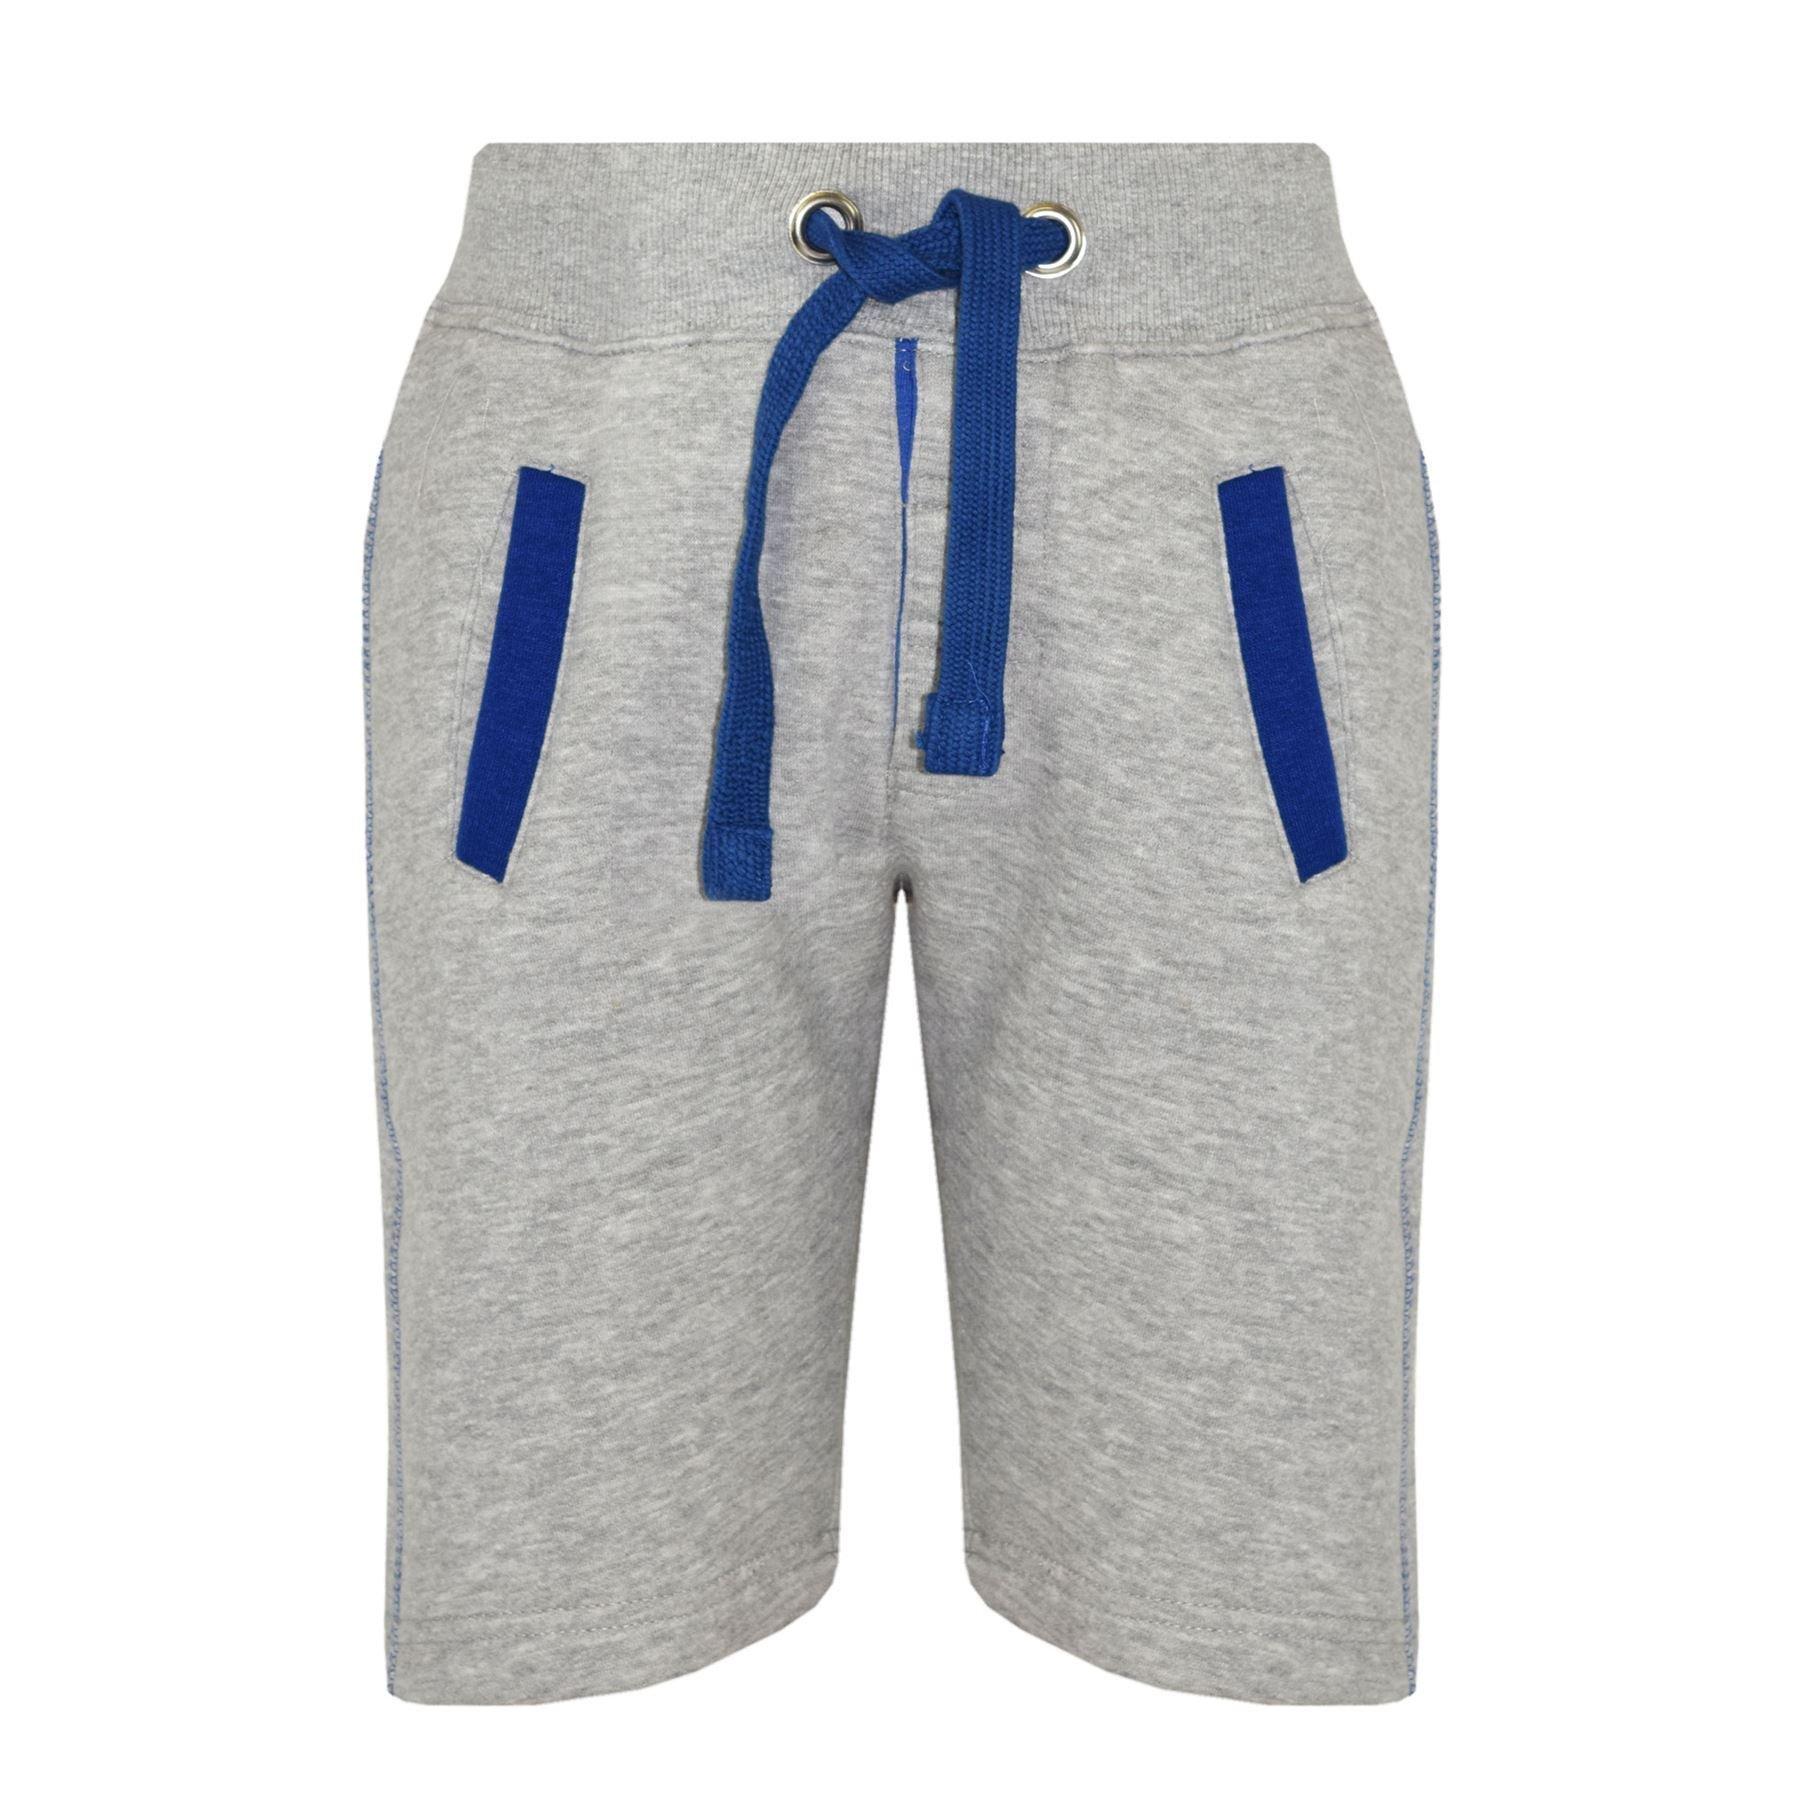 A2Z 4 Kids/® Kids Boys Shorts Designers Dark Blue Denim Ripped Chino Bermuda Jeans Shorts Casual Knee Length Half Pant New Age 5 6 7 8 9 10 11 12 13 Years